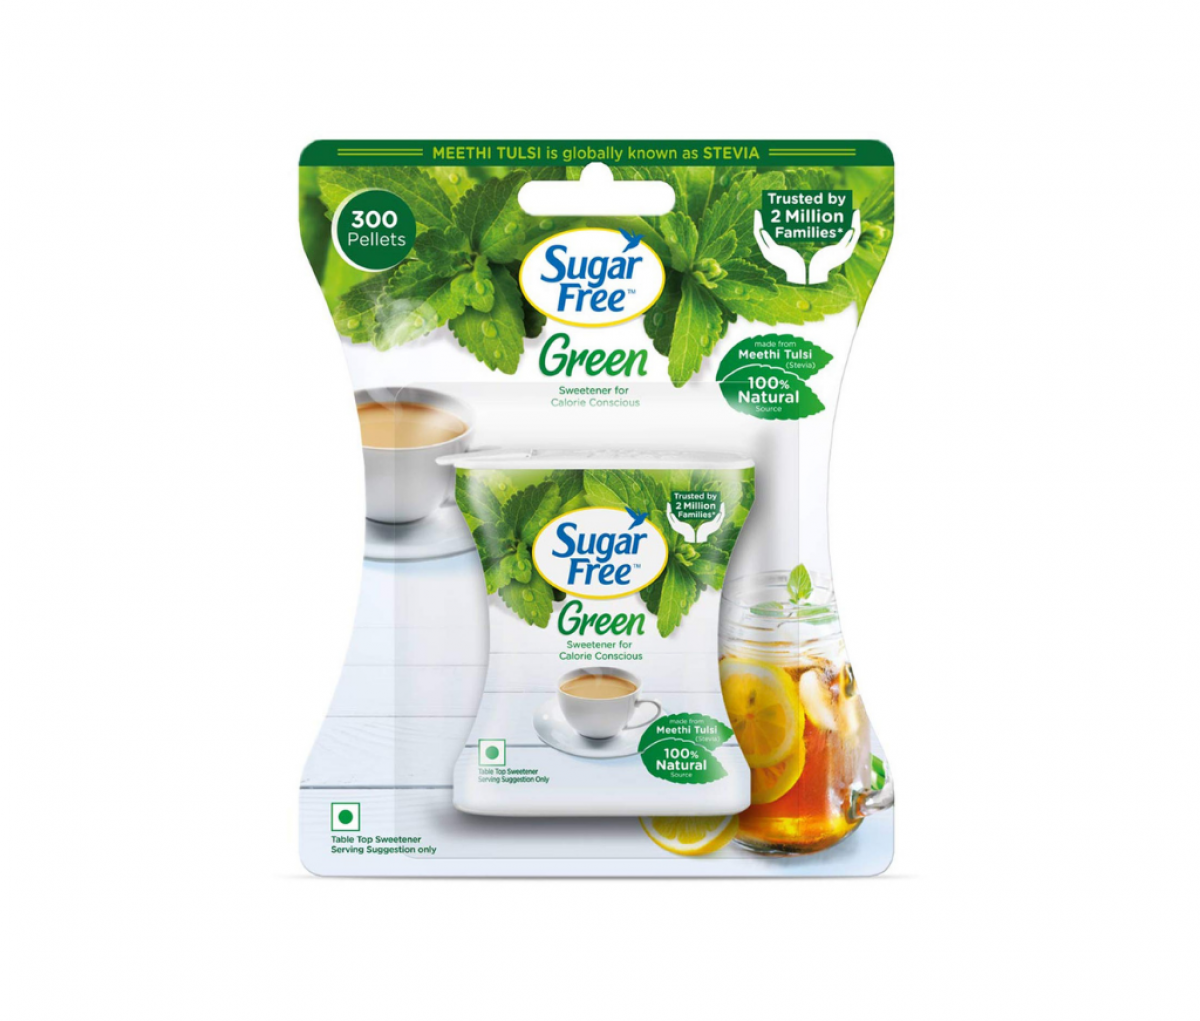 Sugar Free Green Stevia Pellets